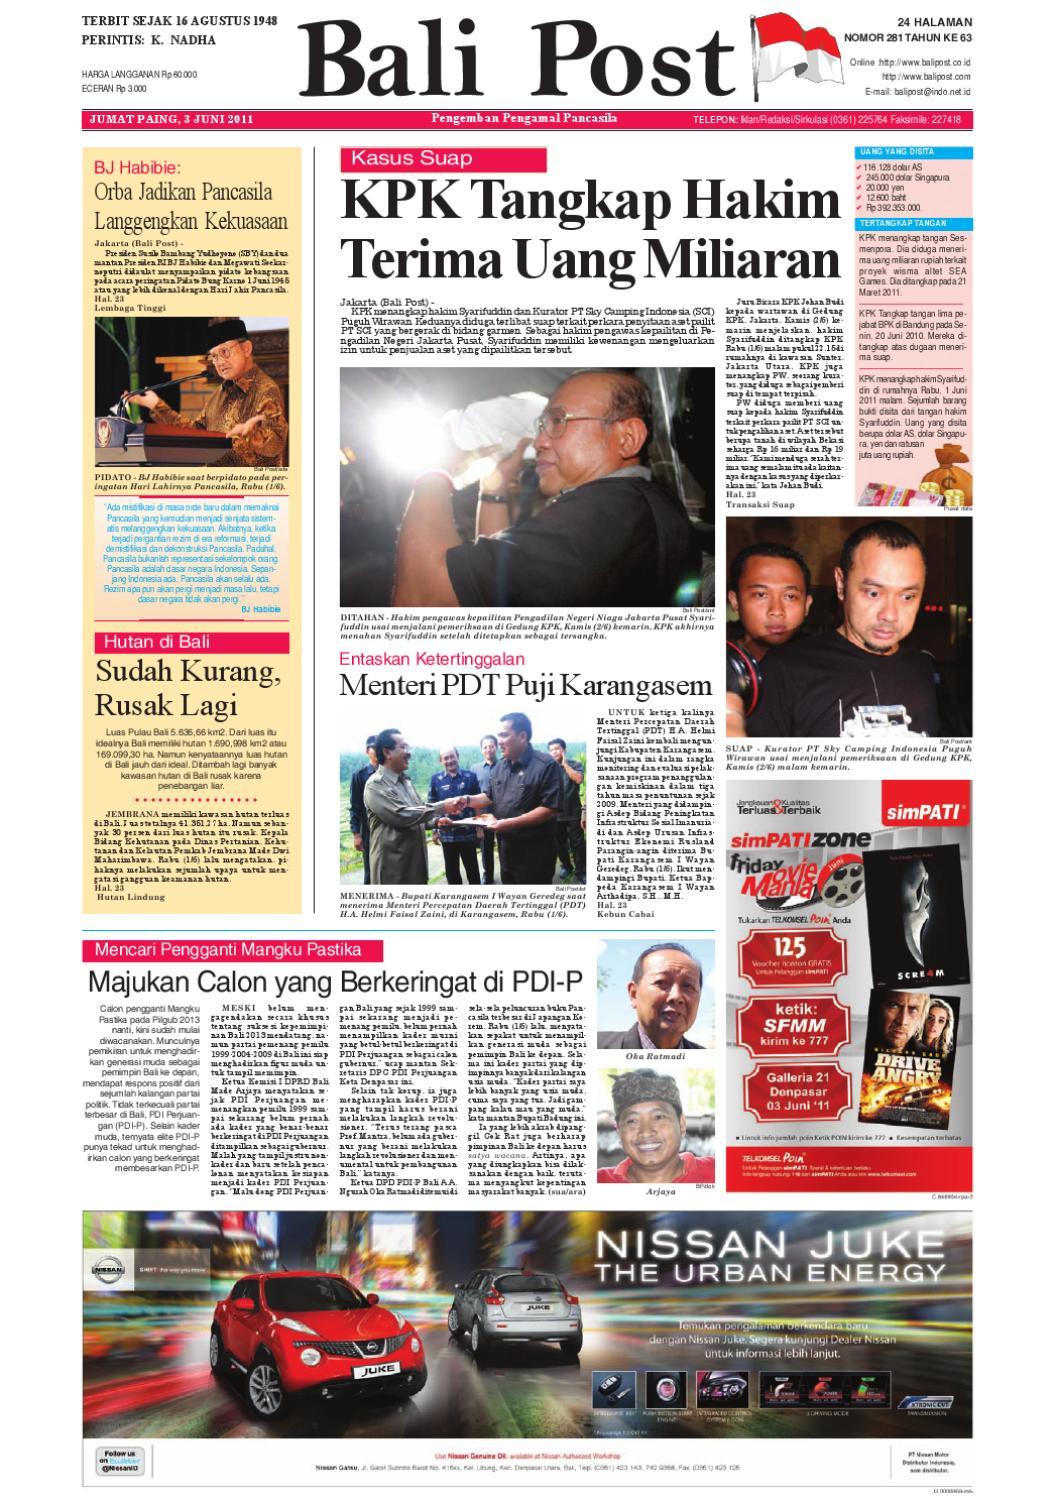 Edisi 3 Juni 2011 Balipostcom By E Paper Kmb Issuu Produk Ukm Bumn Wisata Mewah Bali 3hr 2mlm